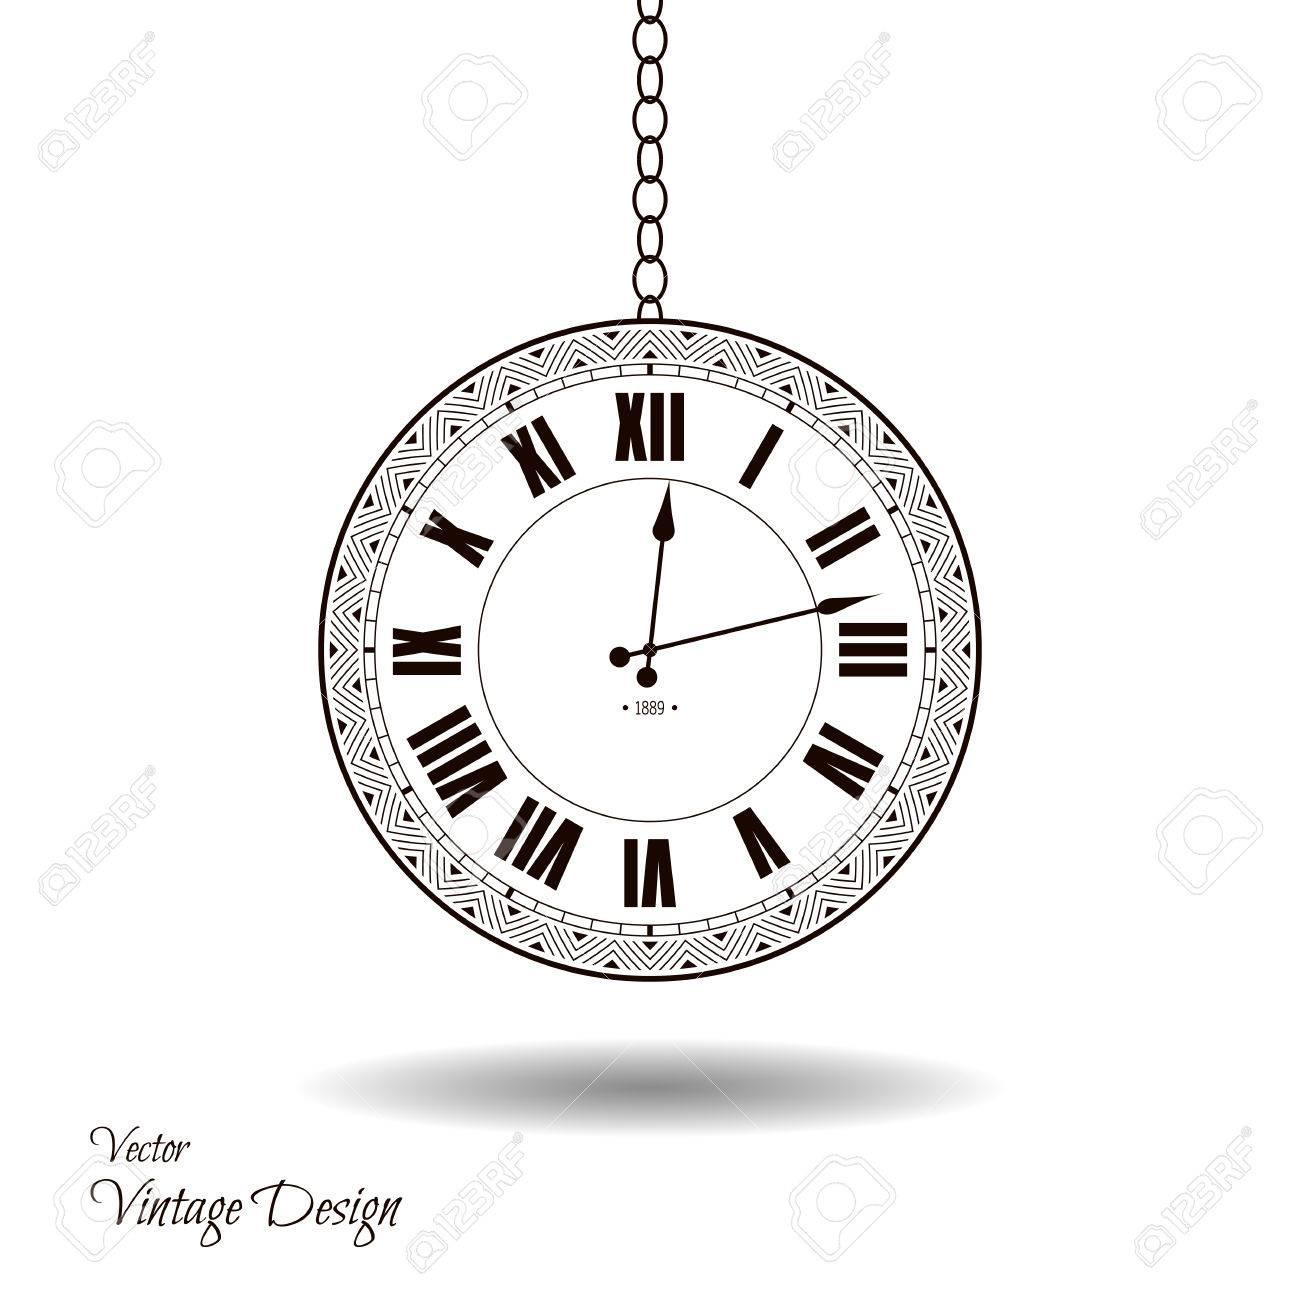 Vector esfera del reloj de la vendimia. aislado antiguo reloj clásico. diseño retro temporizador antigua. silueta tradicional. diseño gráfico objeto